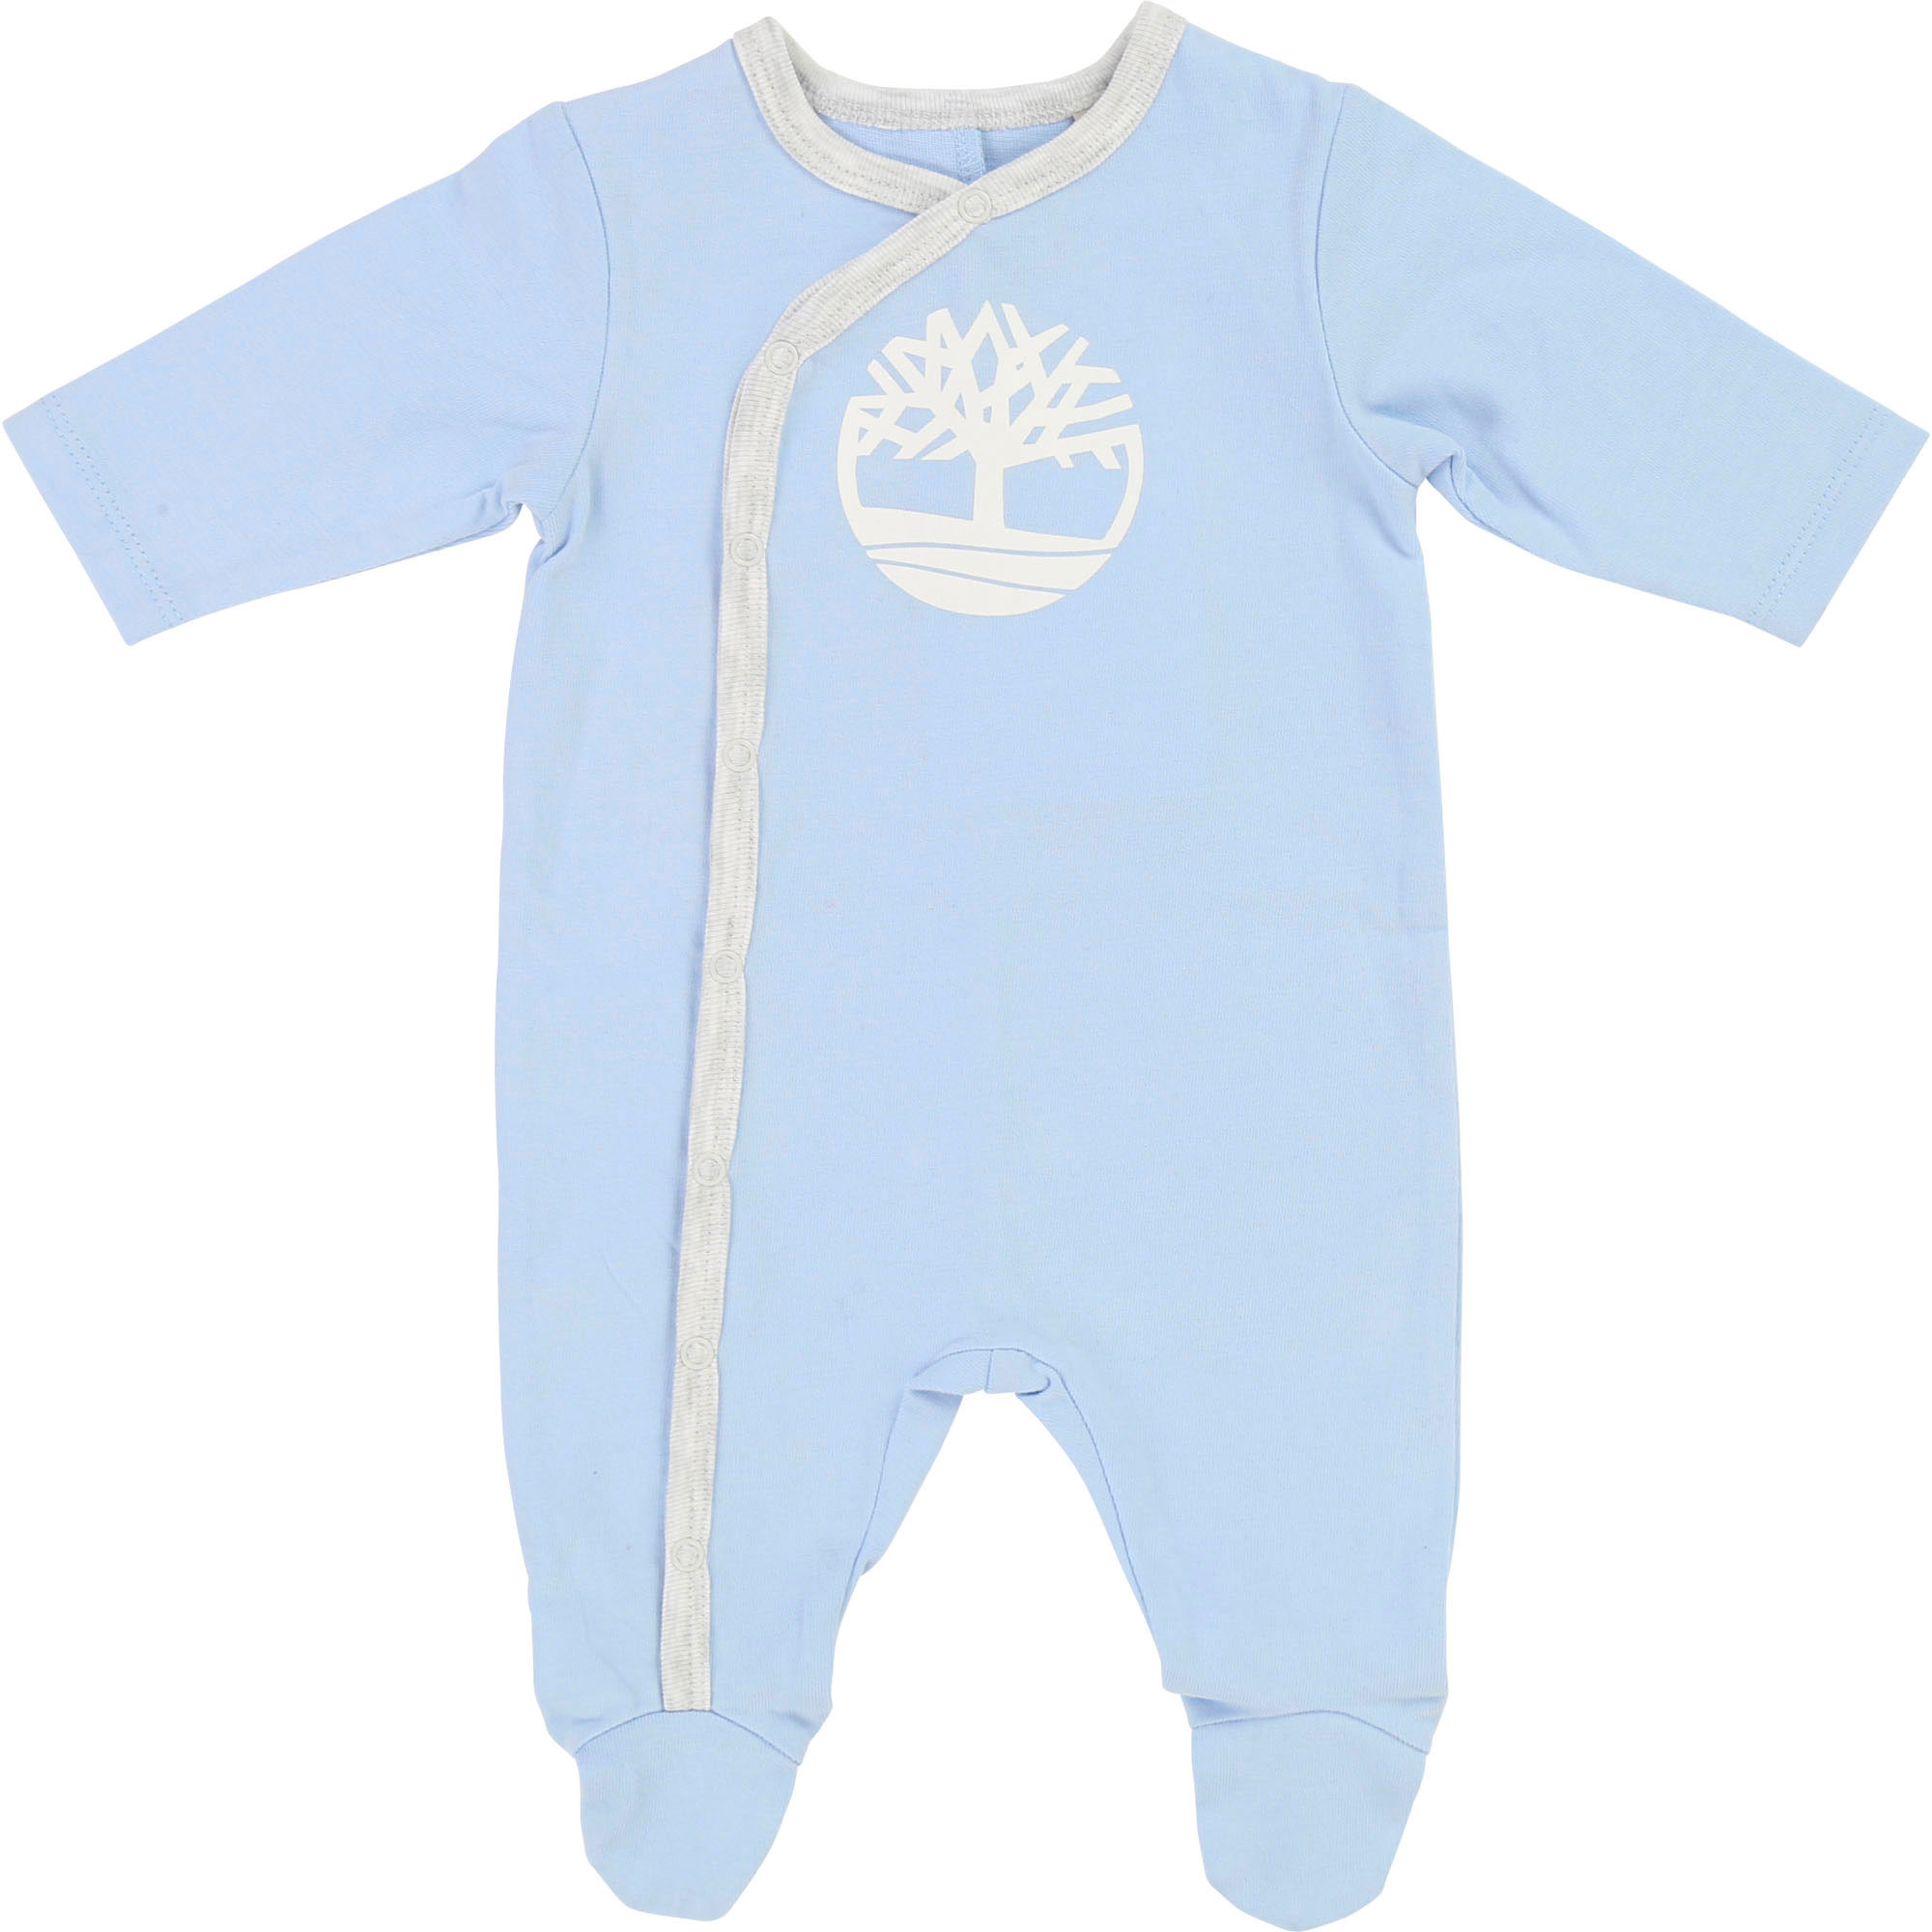 Pyjama 1 pièce en jersey coton TIMBERLAND BEBE COUCHE GARCON Bleu